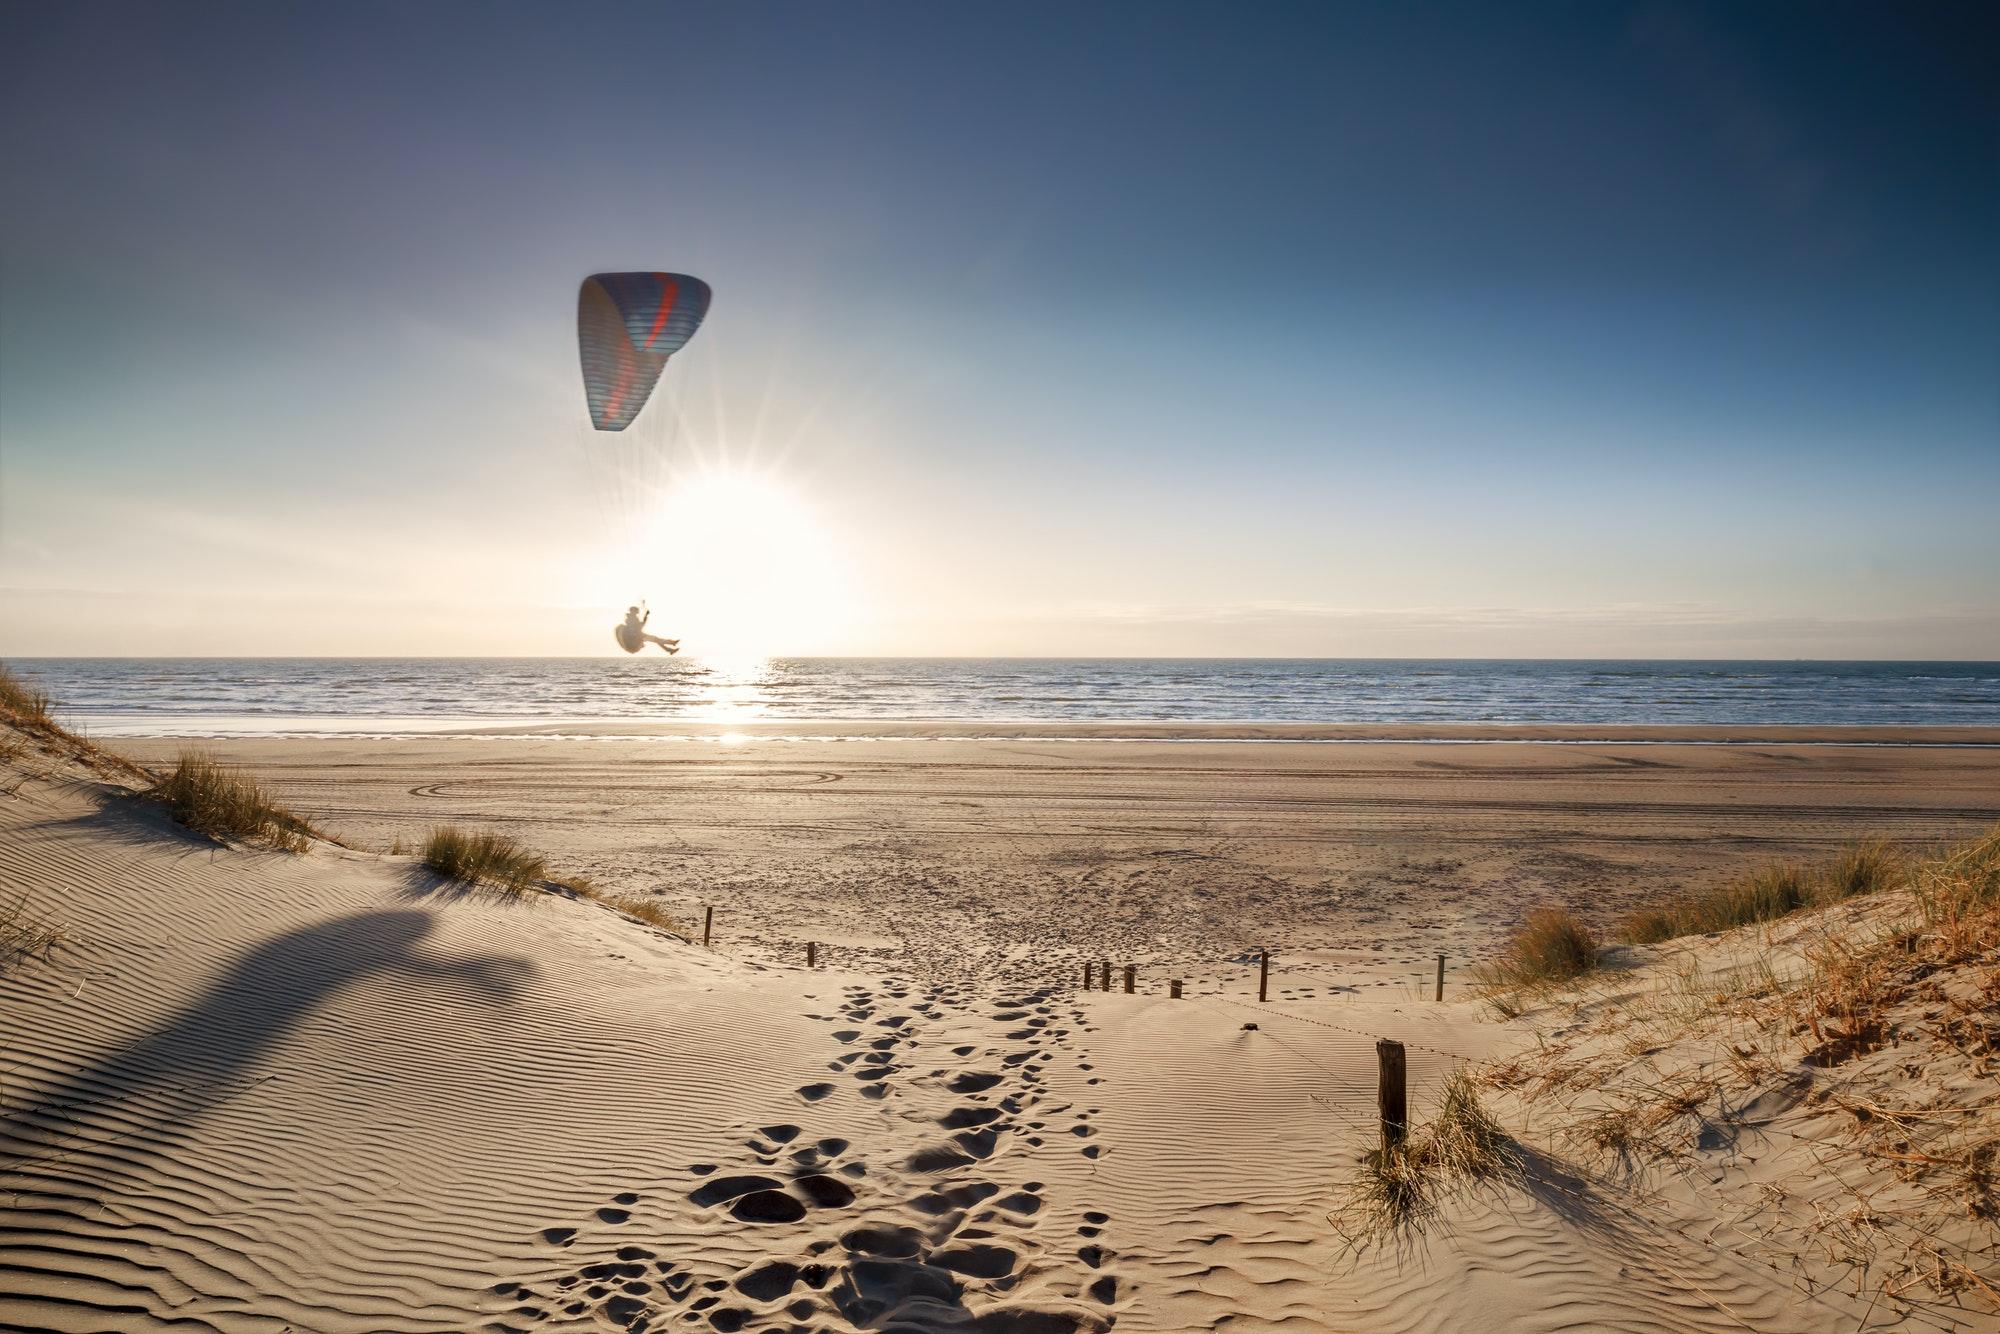 man paragliding on beach at sunset